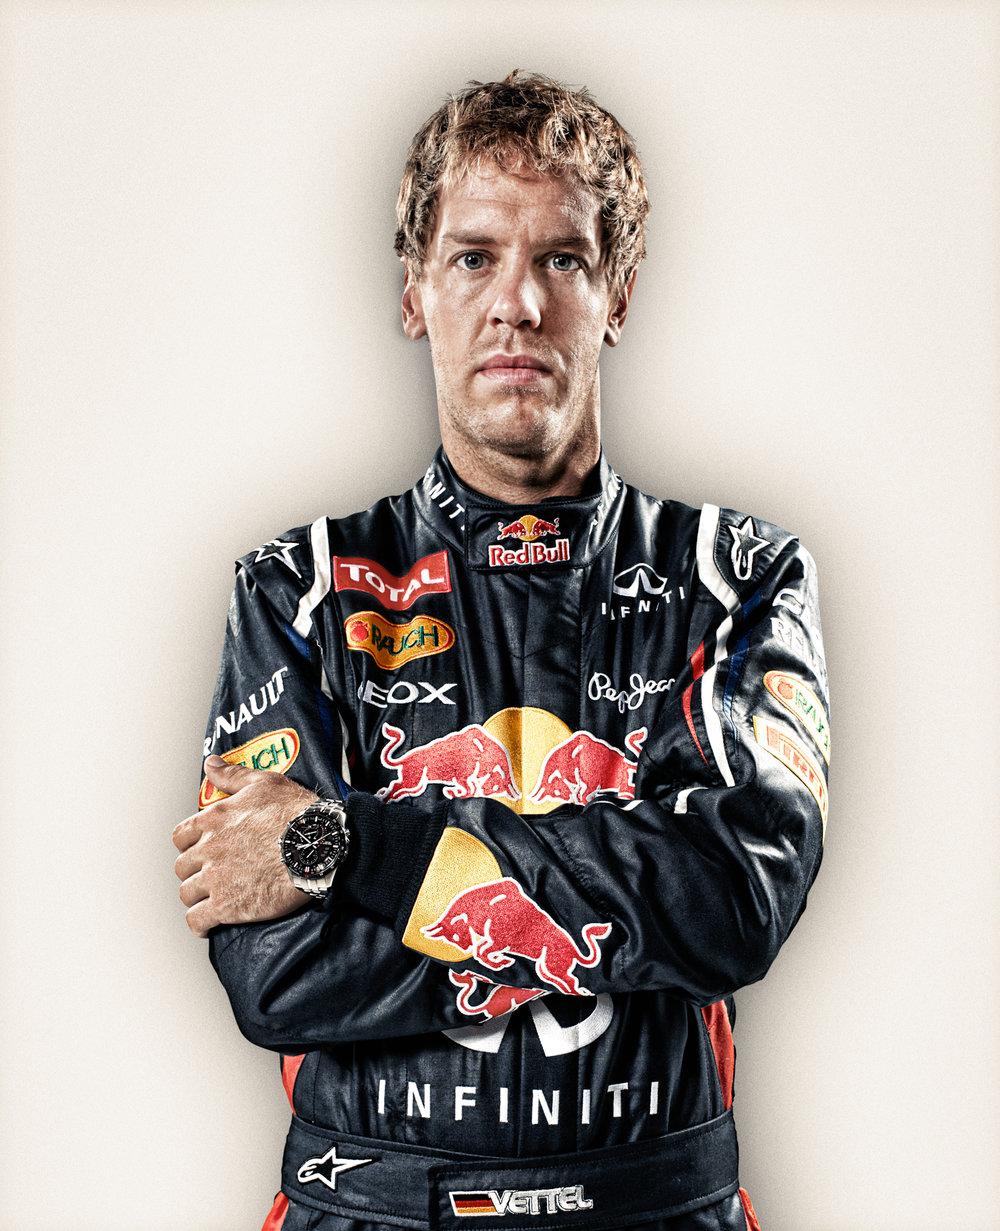 110704_Casio_Vettel2.jpg